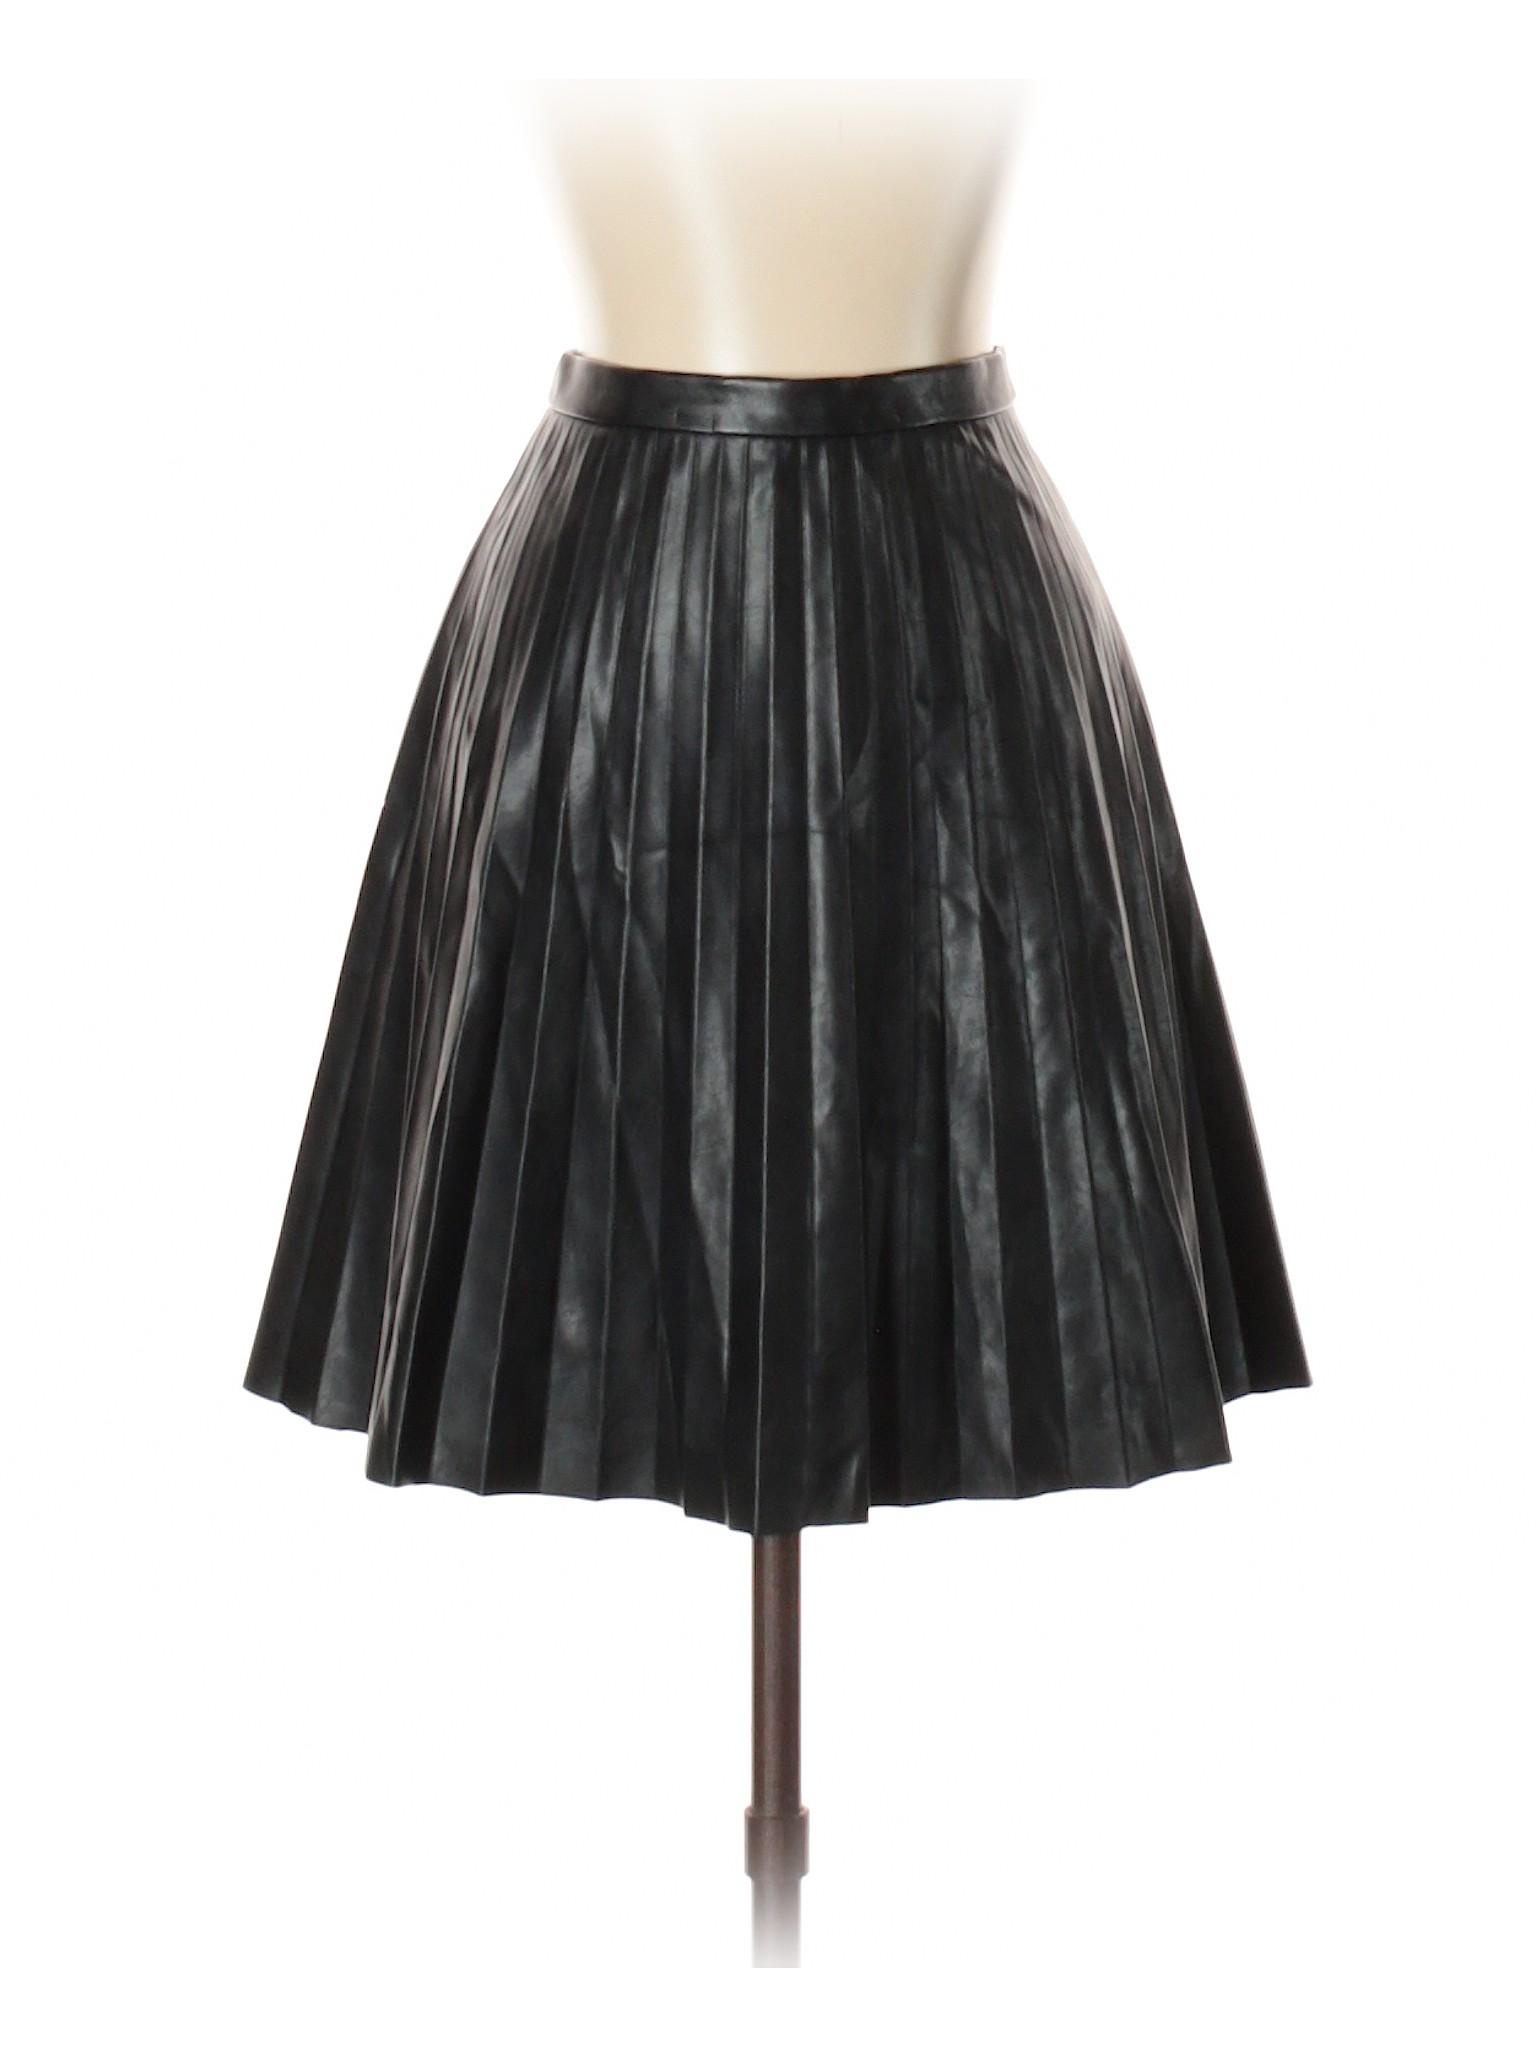 Boutique J leisure Skirt Leather Crew Faux BBFgw